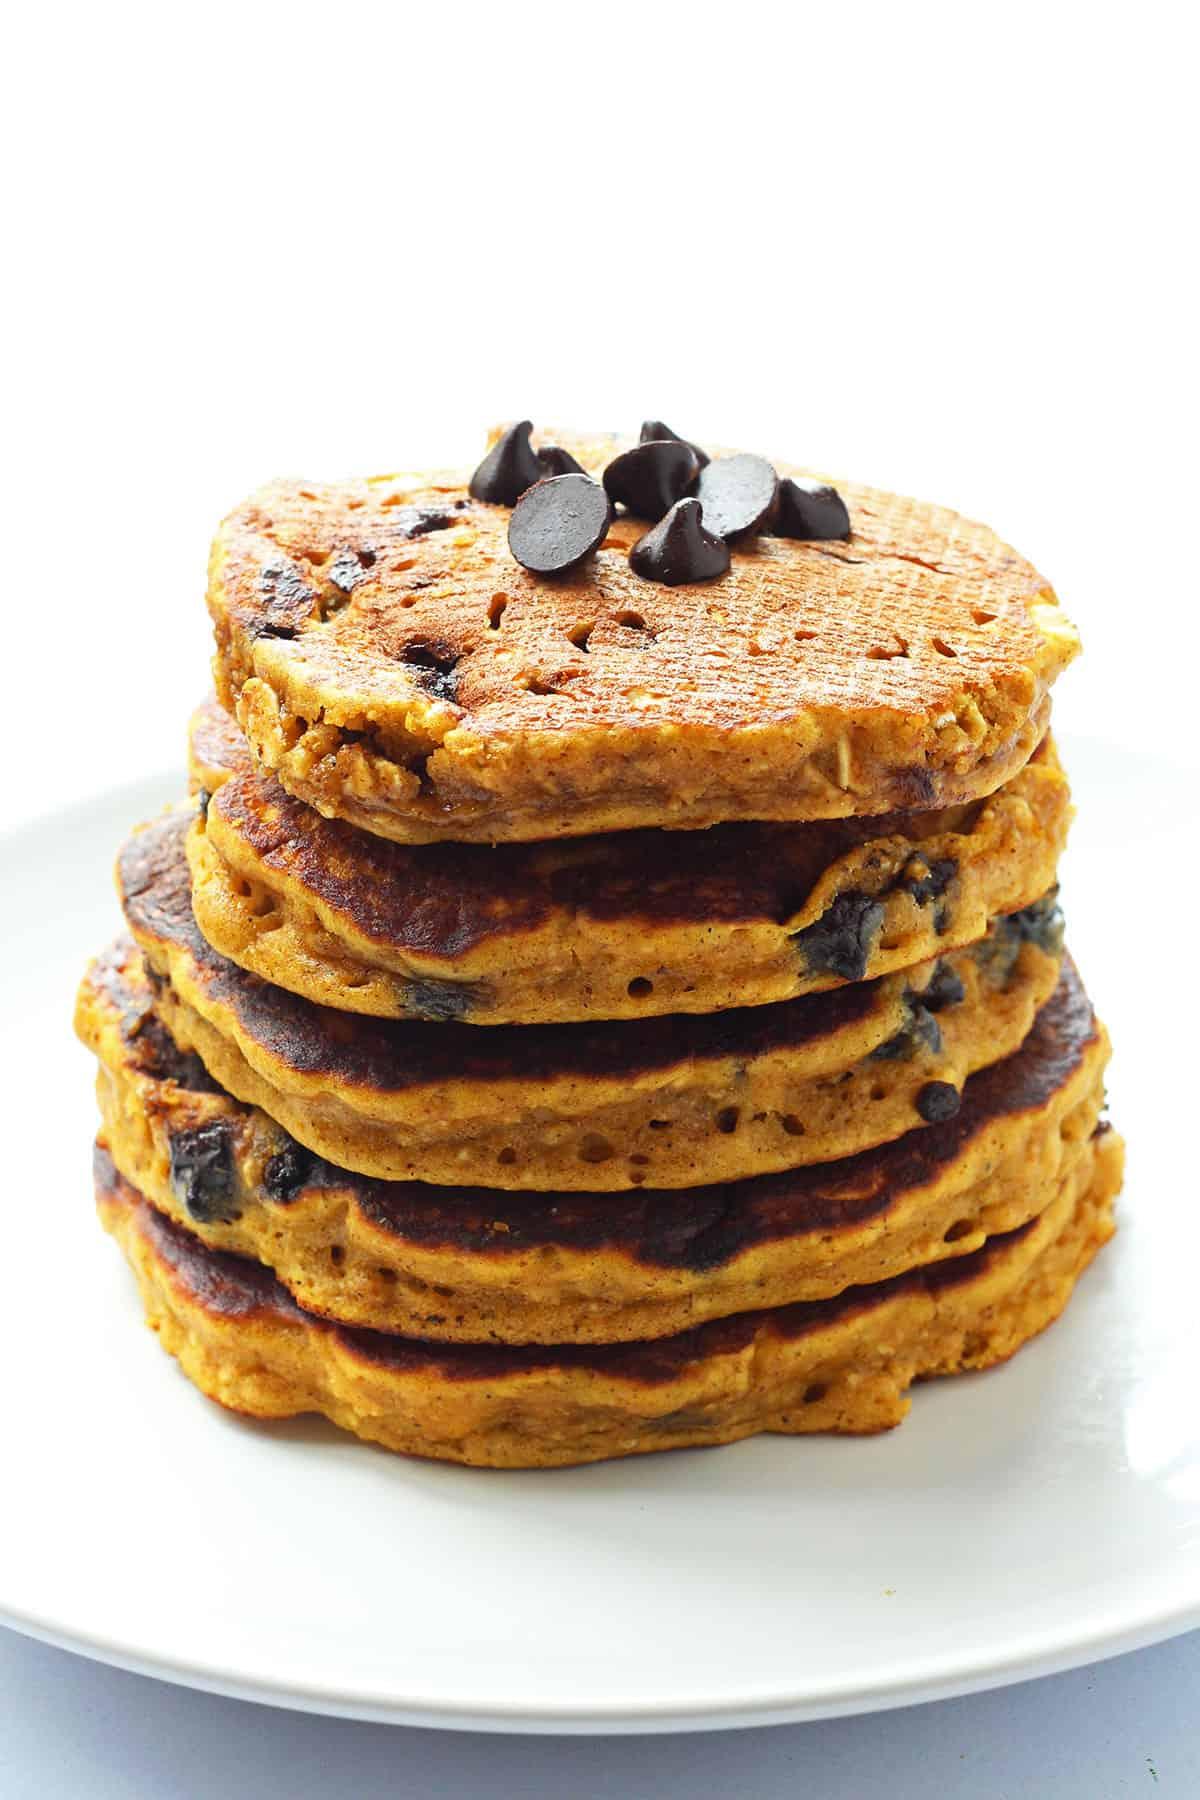 Pumpkin Oatmeal Pancakes with Chocolate